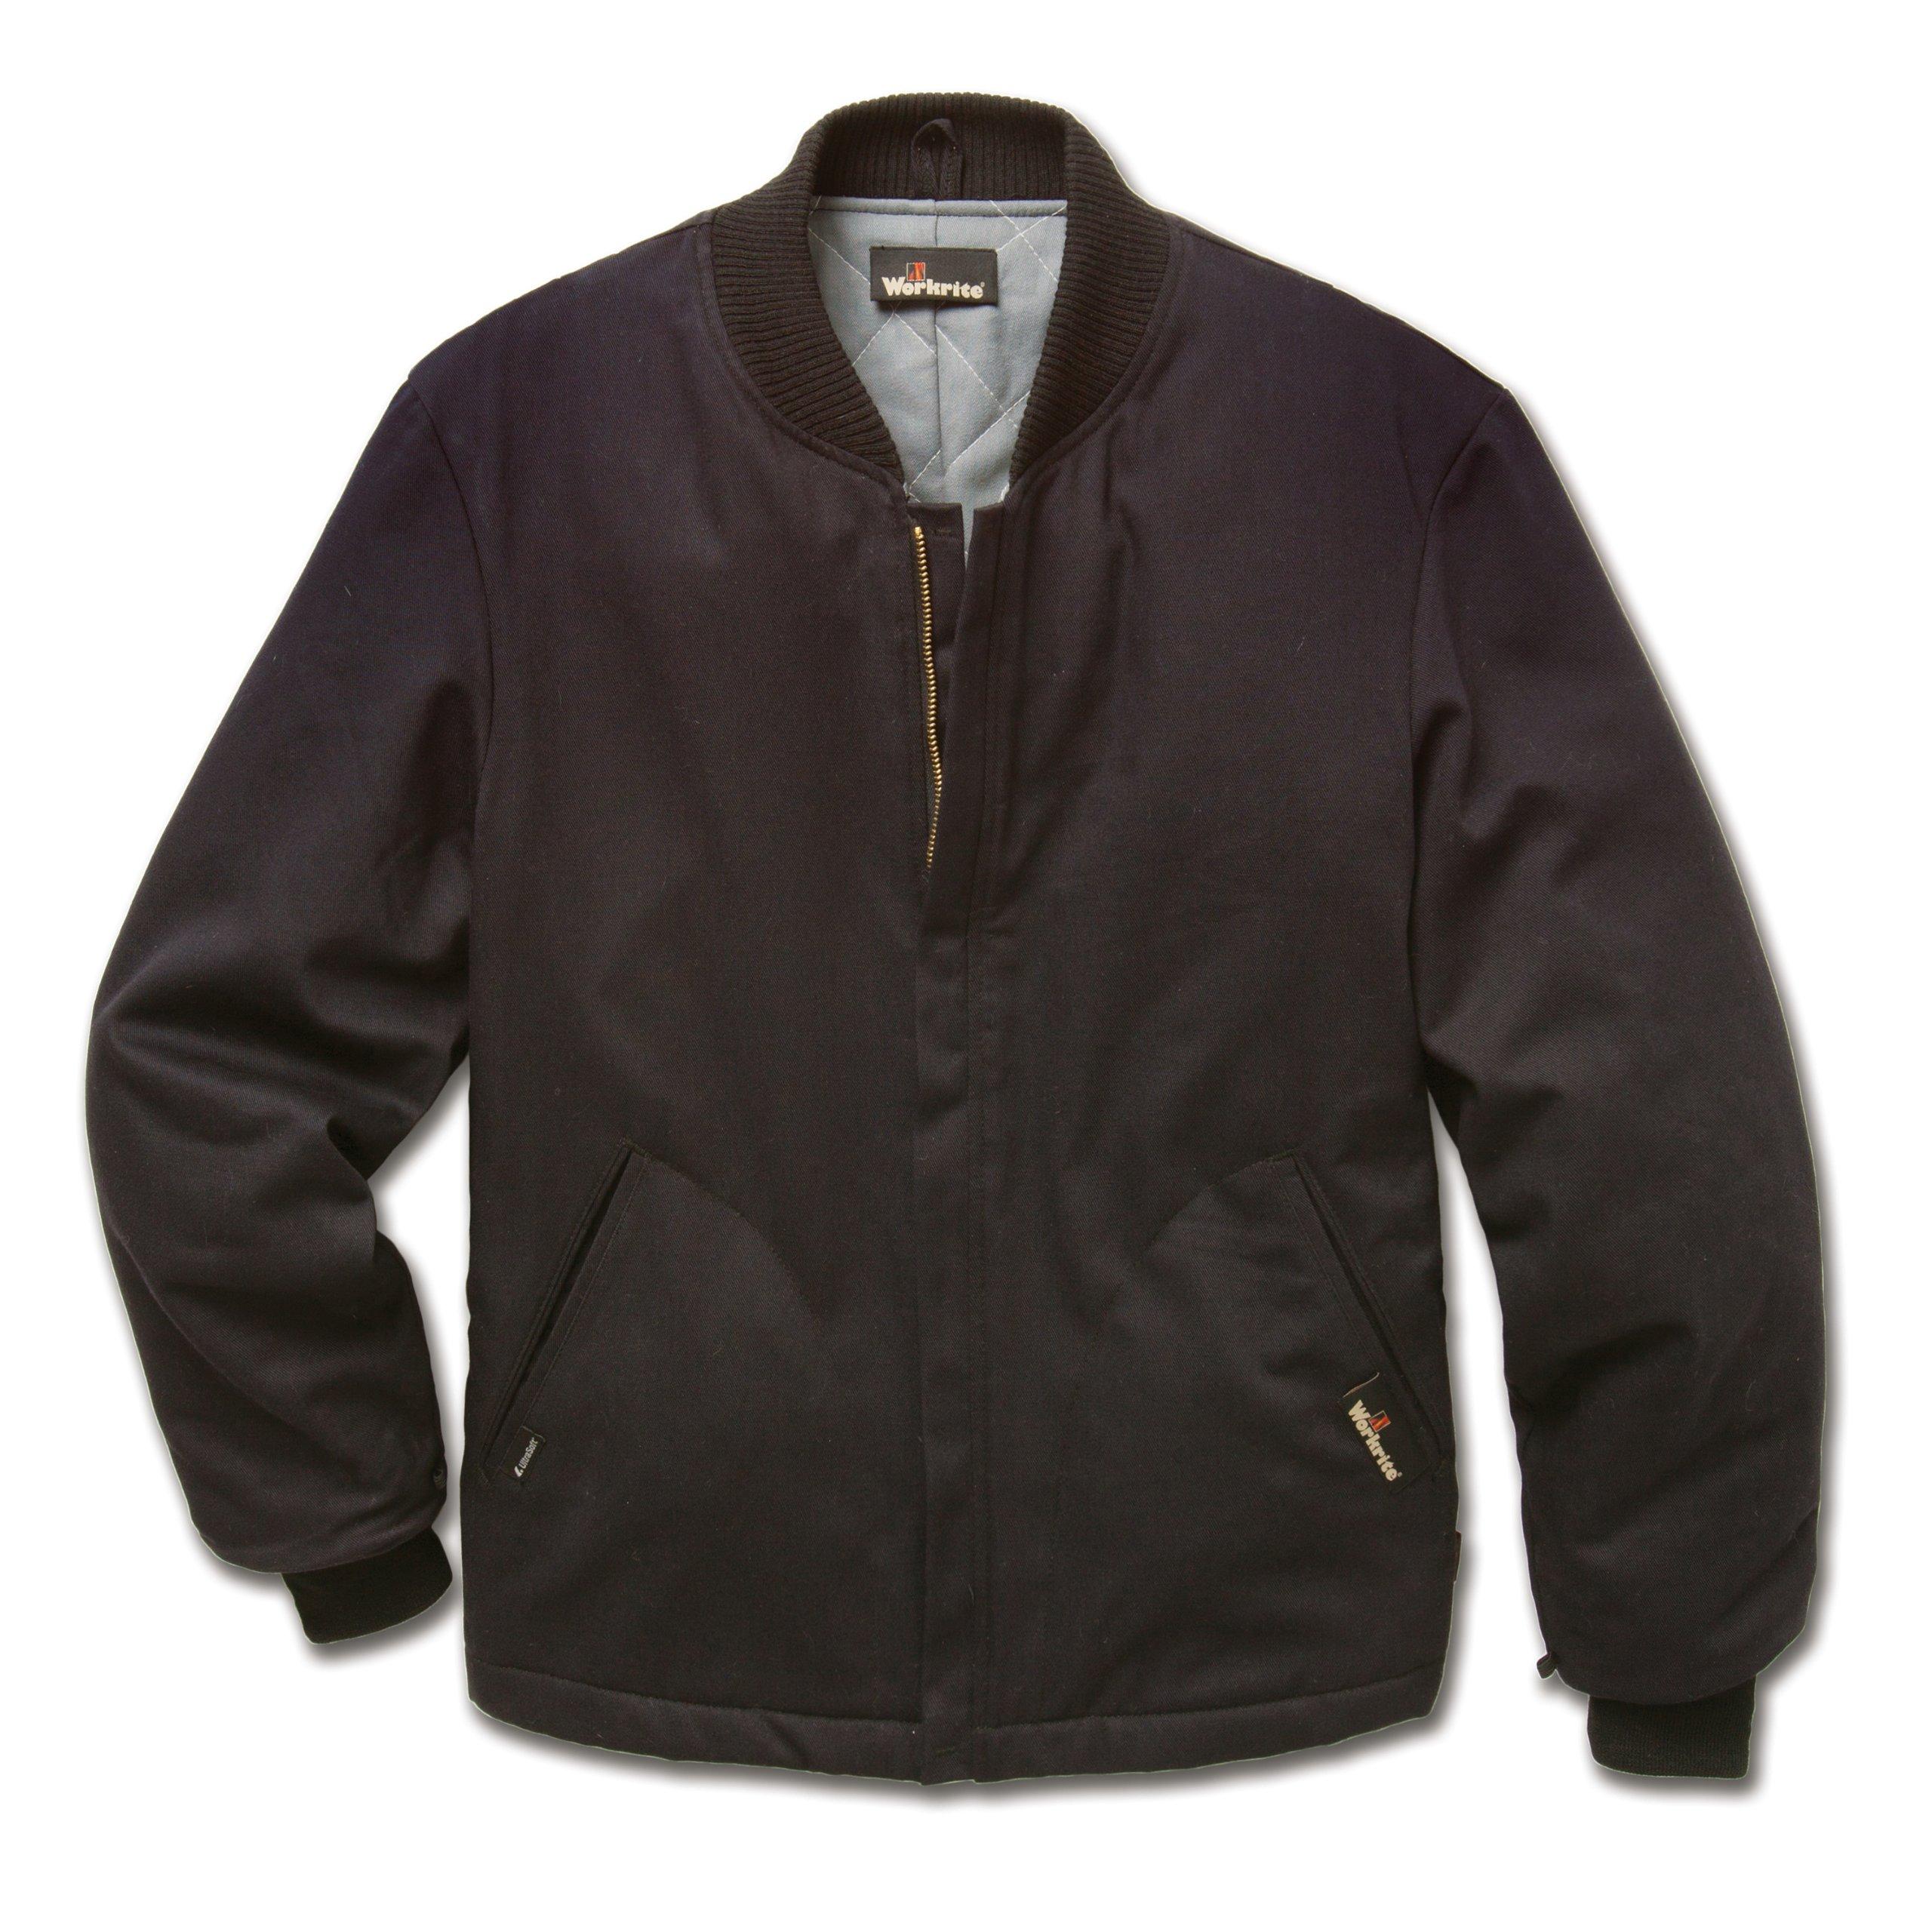 Workrite FR Flame Resistant 4.5 oz Nomex IIIA Athletic-Style Jacket/Liner, Knit Cuff, 2X-Large, Regular Length, Black